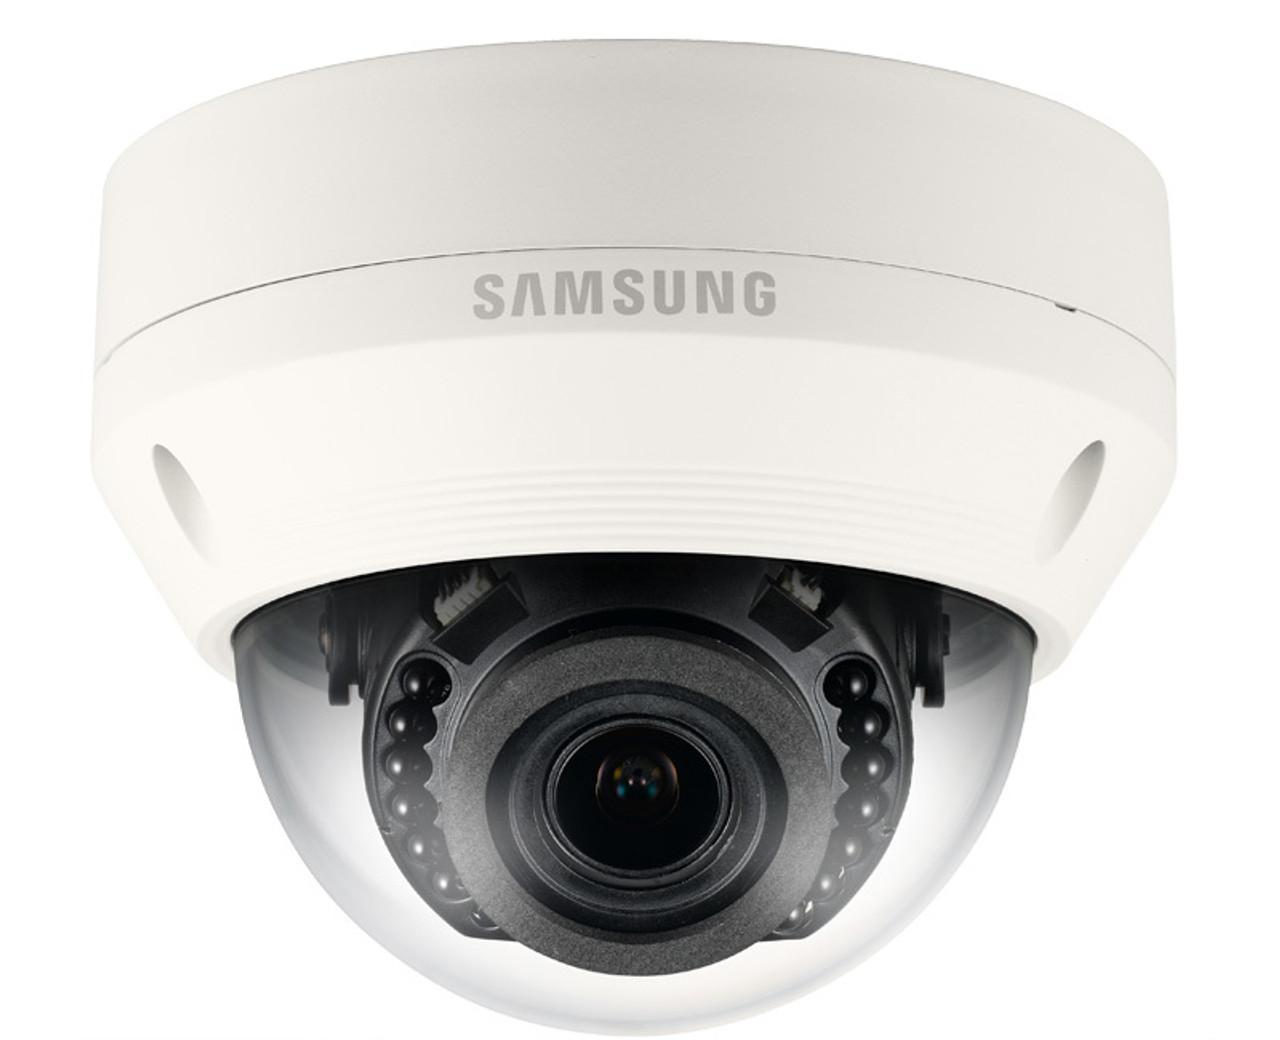 Samsung SNV-L6083R 2 1MP Outdoor Dome IP Security Camera - 2 8~12mm  Varifocal Lens, IR 65ft